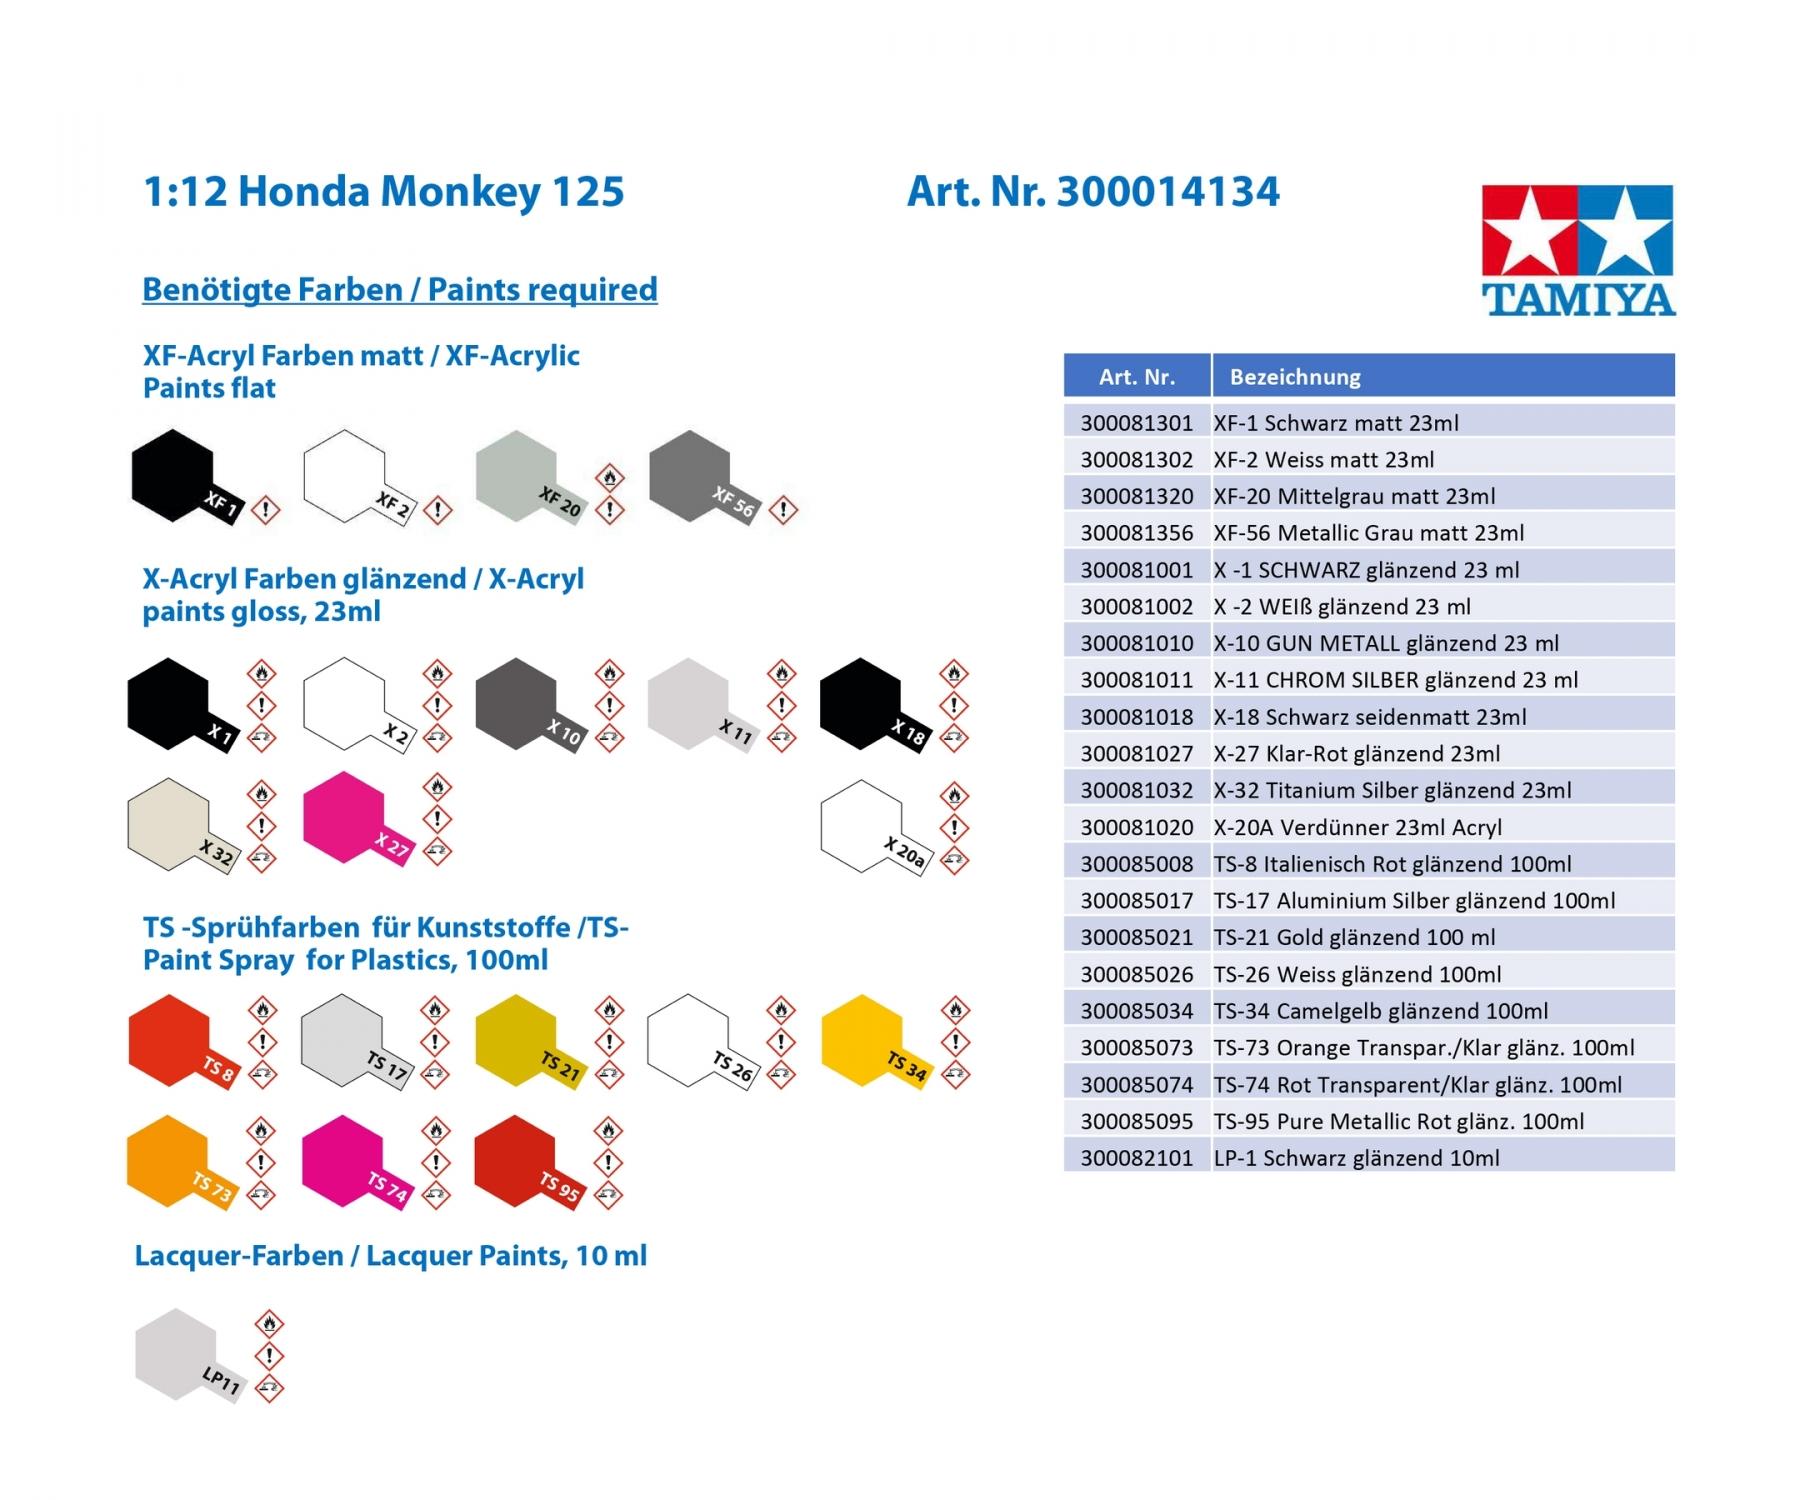 Maquette Tamiya Honda Monkey 125 1/12 - mini4temps.fr